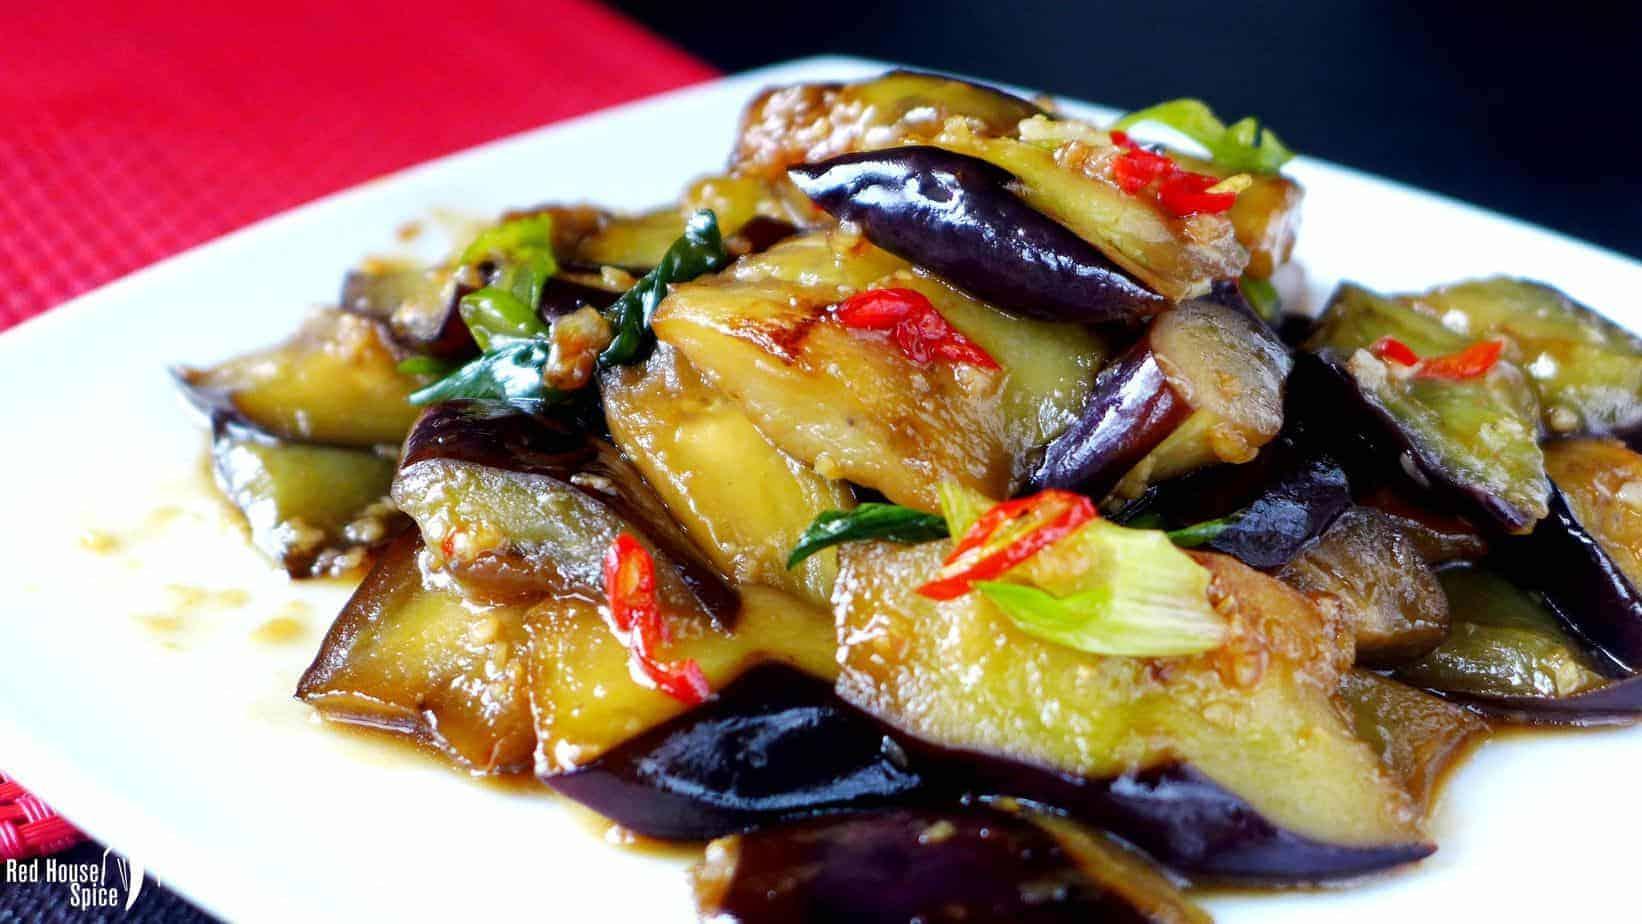 Stir-fried aubergine in plum sauce (苏梅酱茄子)